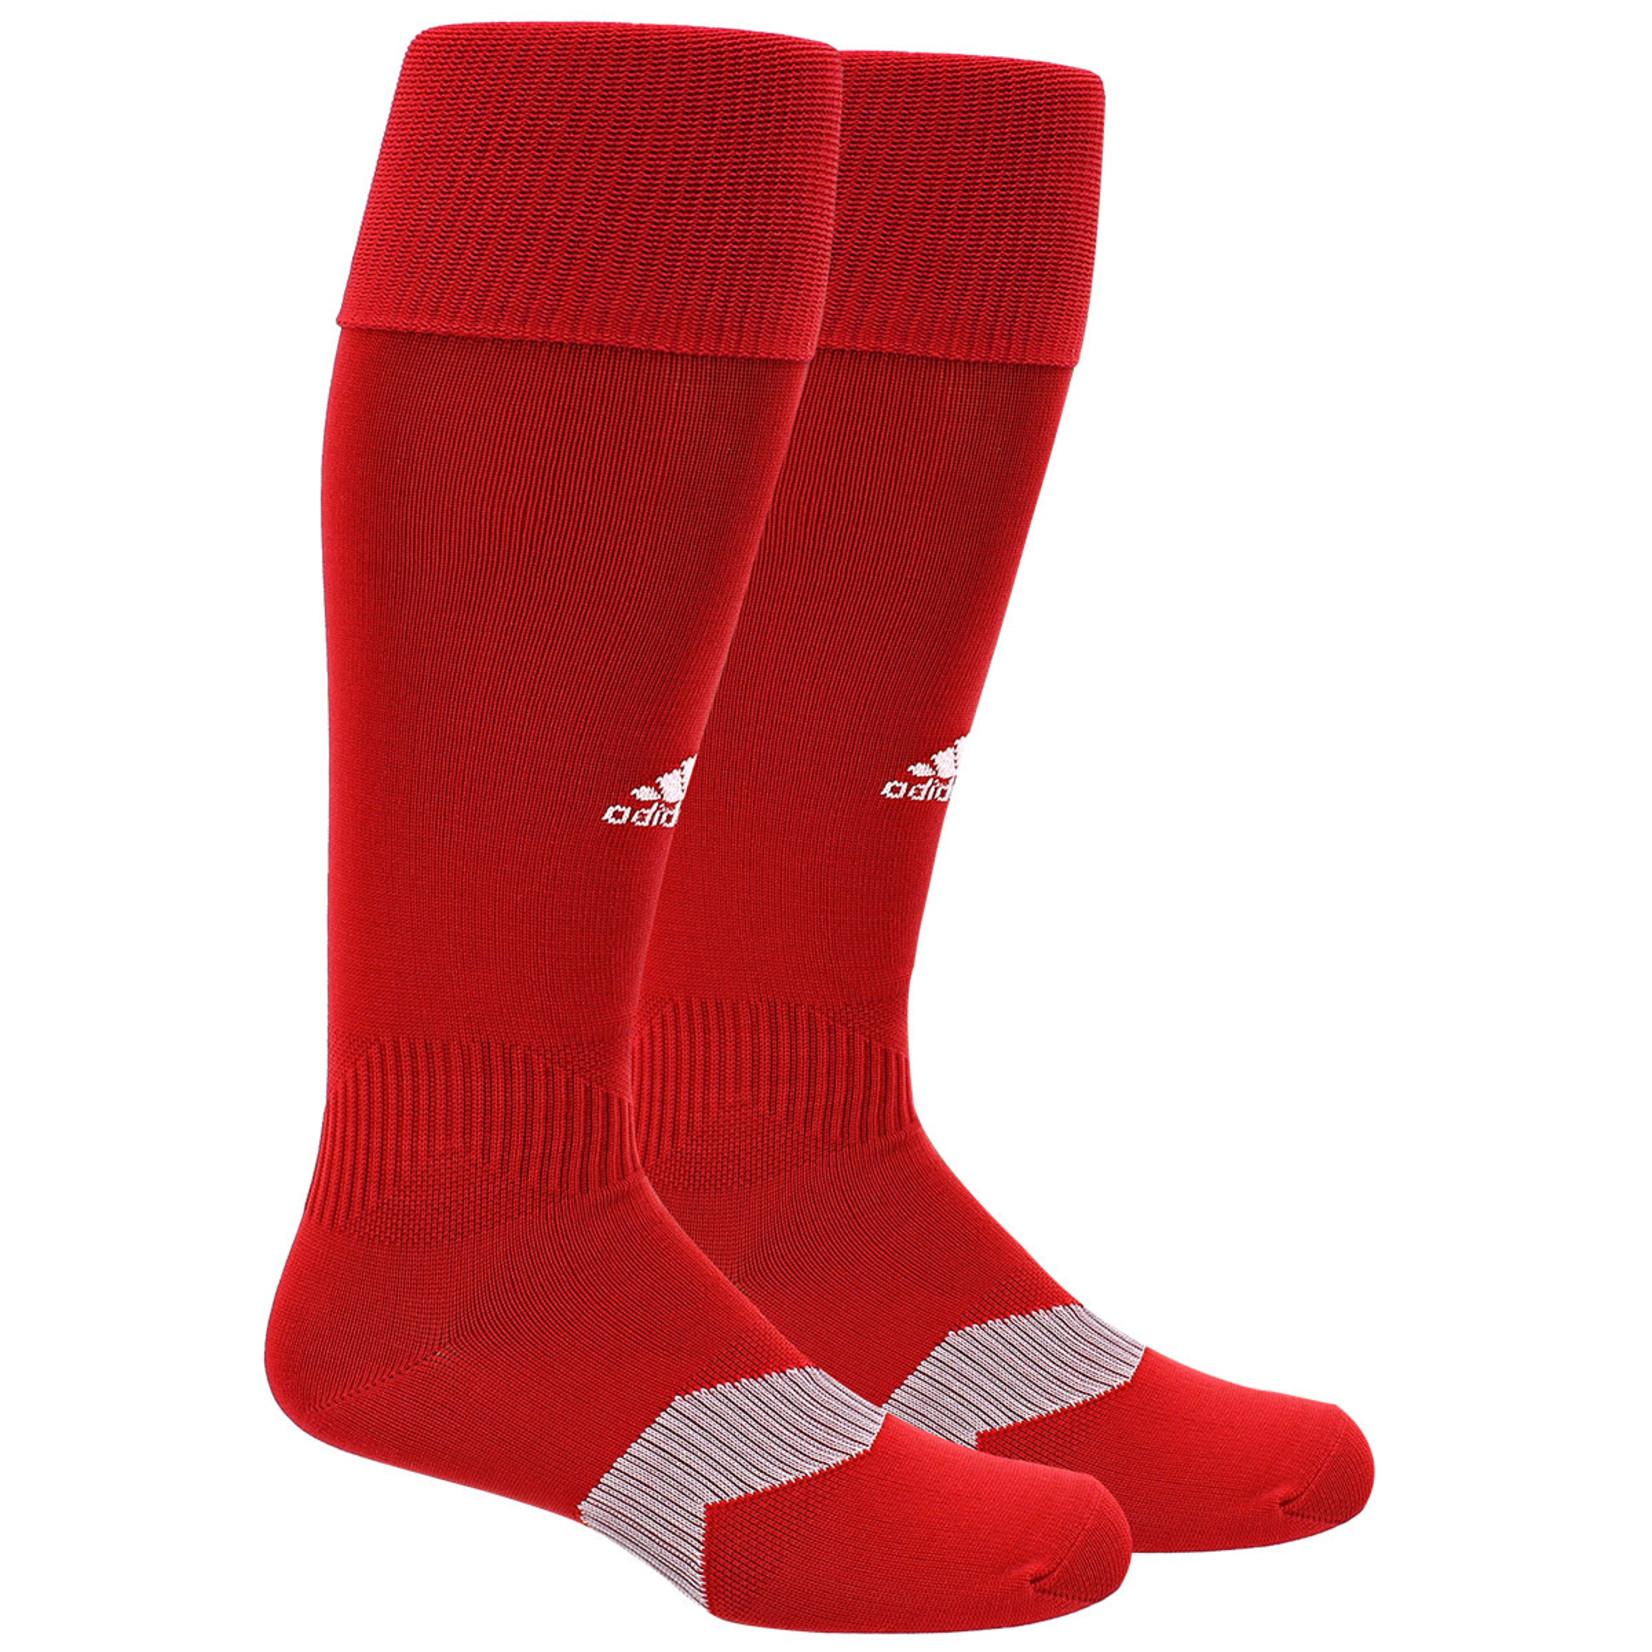 ADIDAS METRO IV SOCKS (RED)